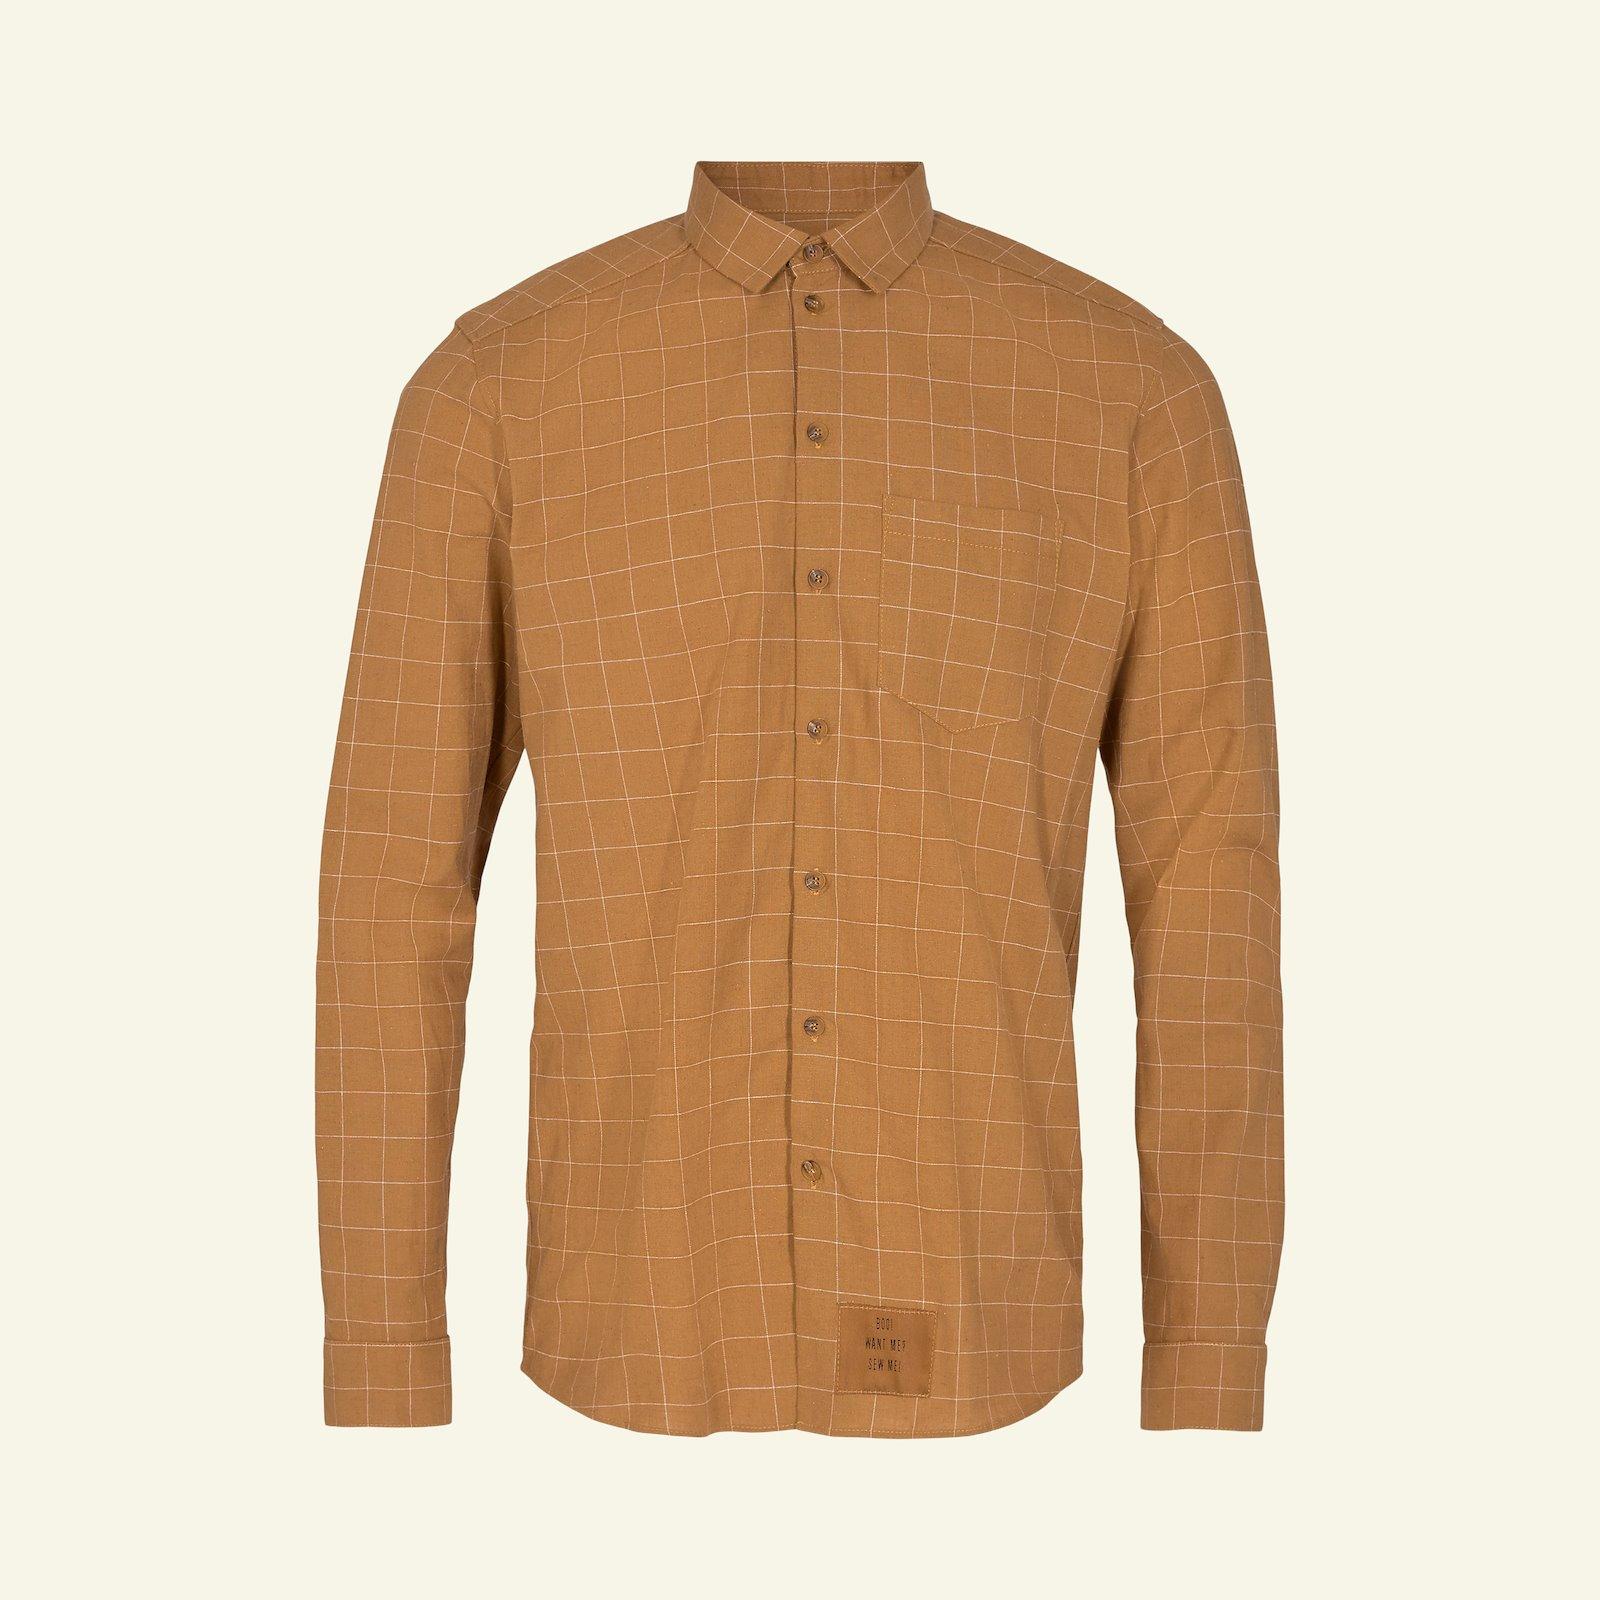 Shirt, M p87001_816178_33044_26542_sskit